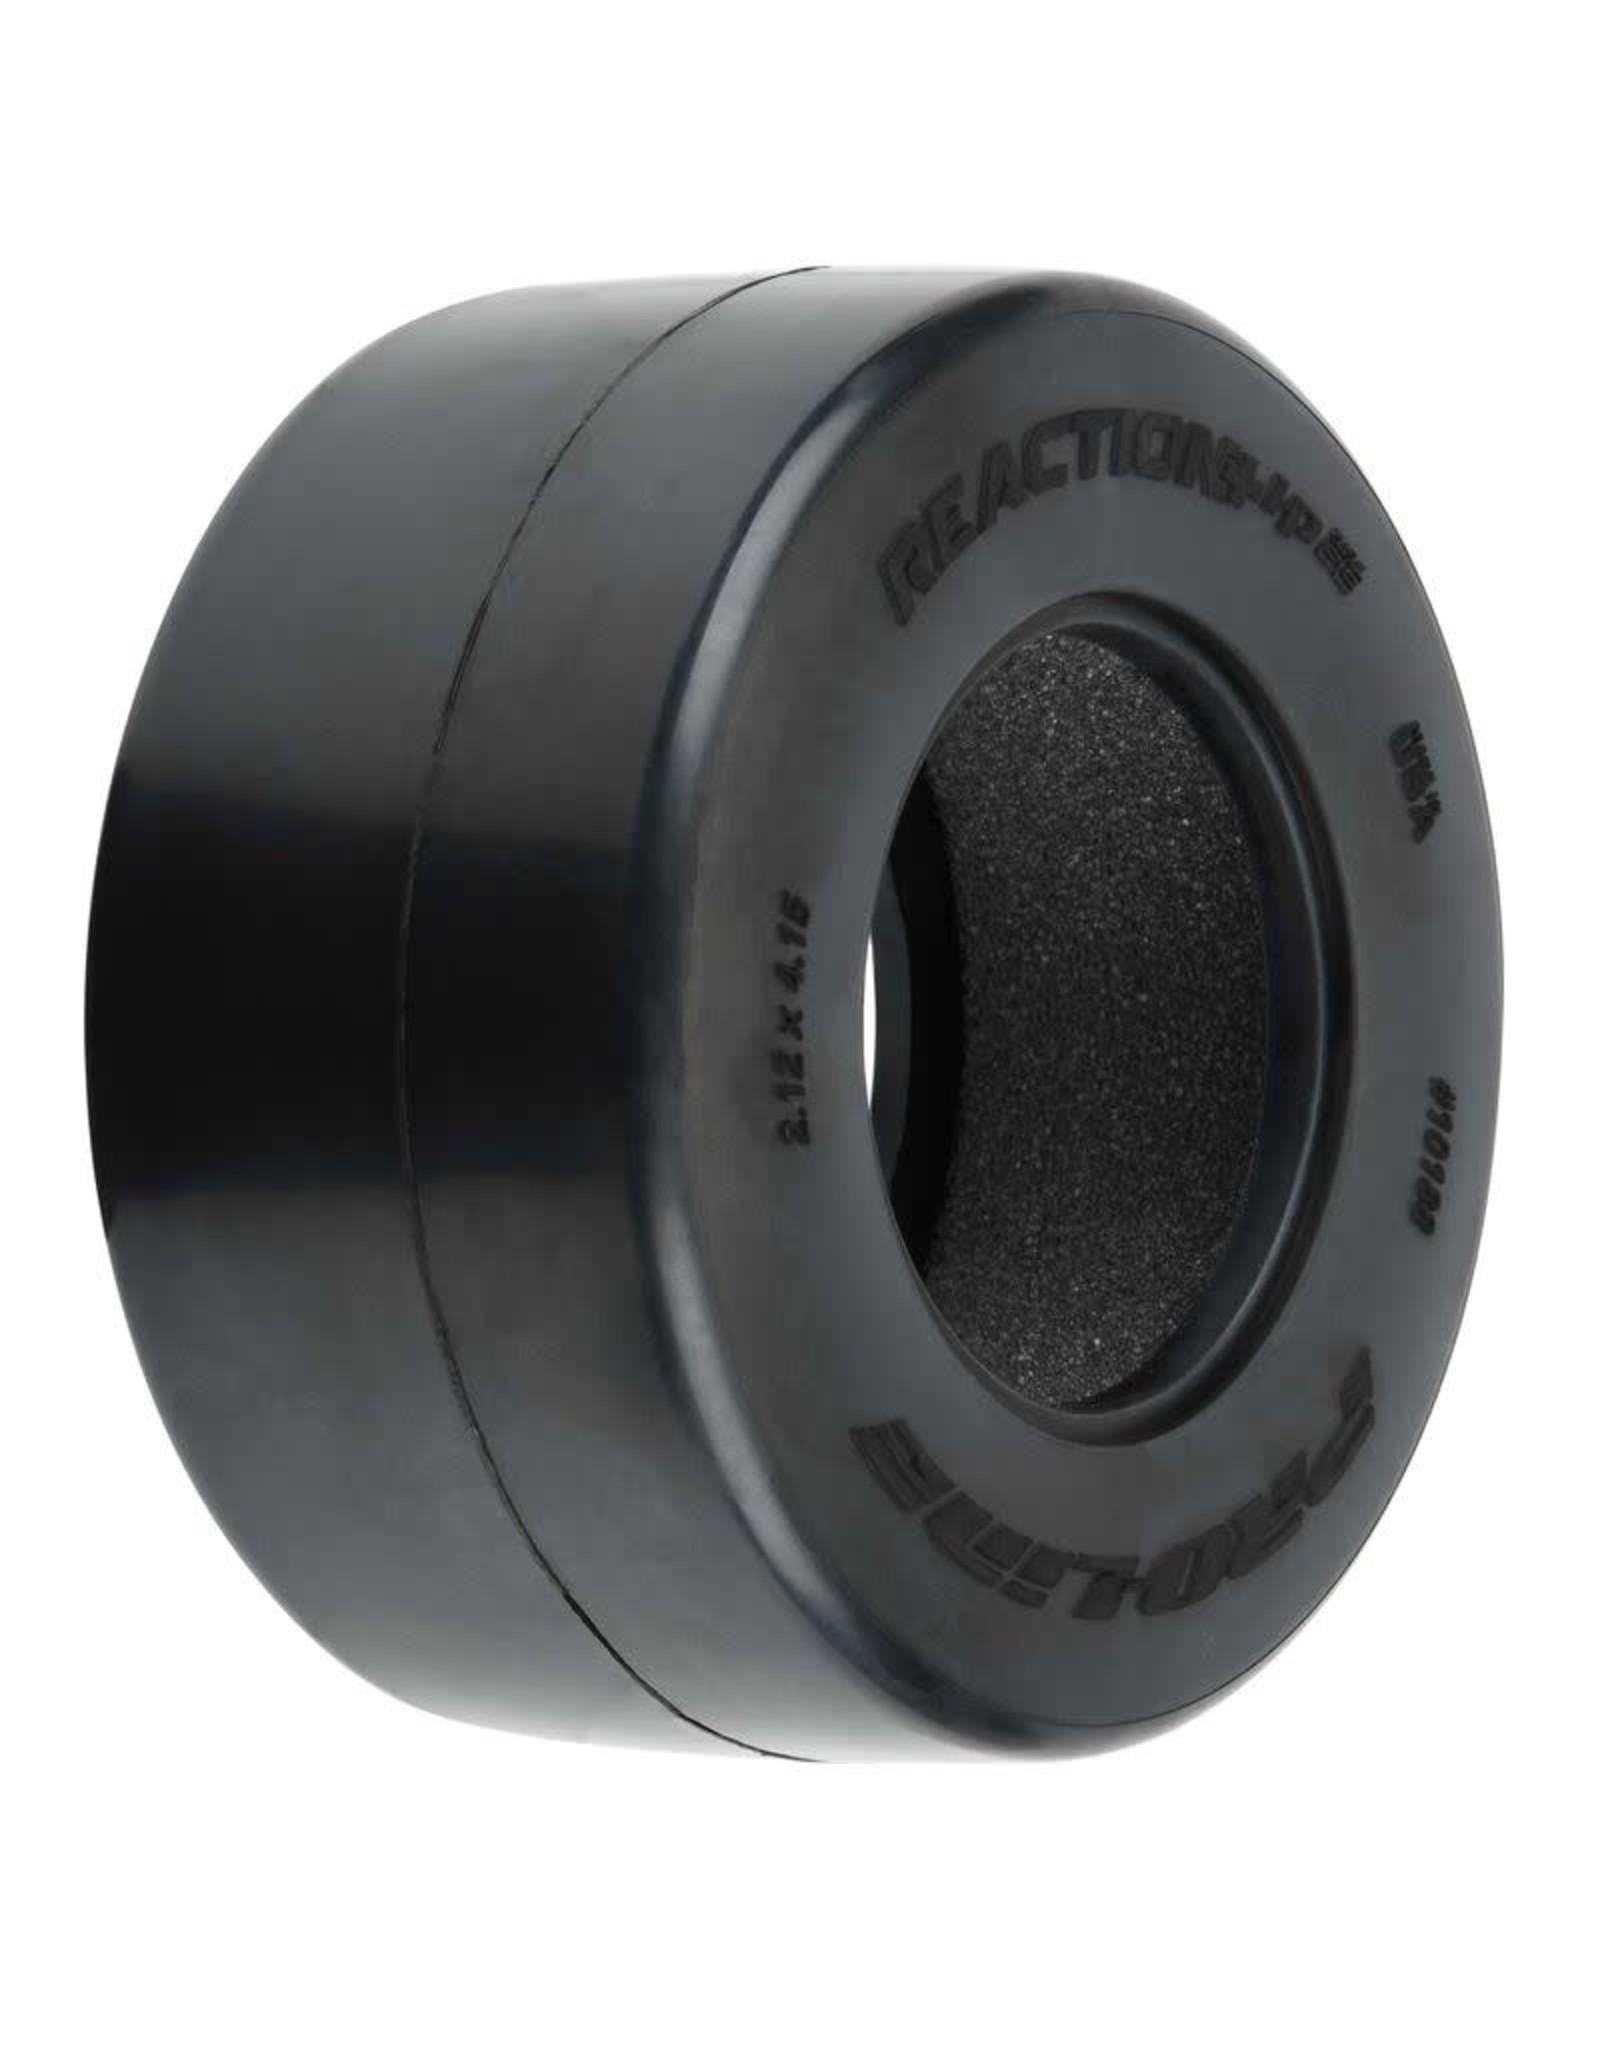 PRO10188203 1/10 Reaction+ HP Wide SC S3 Drag BELTED Tires